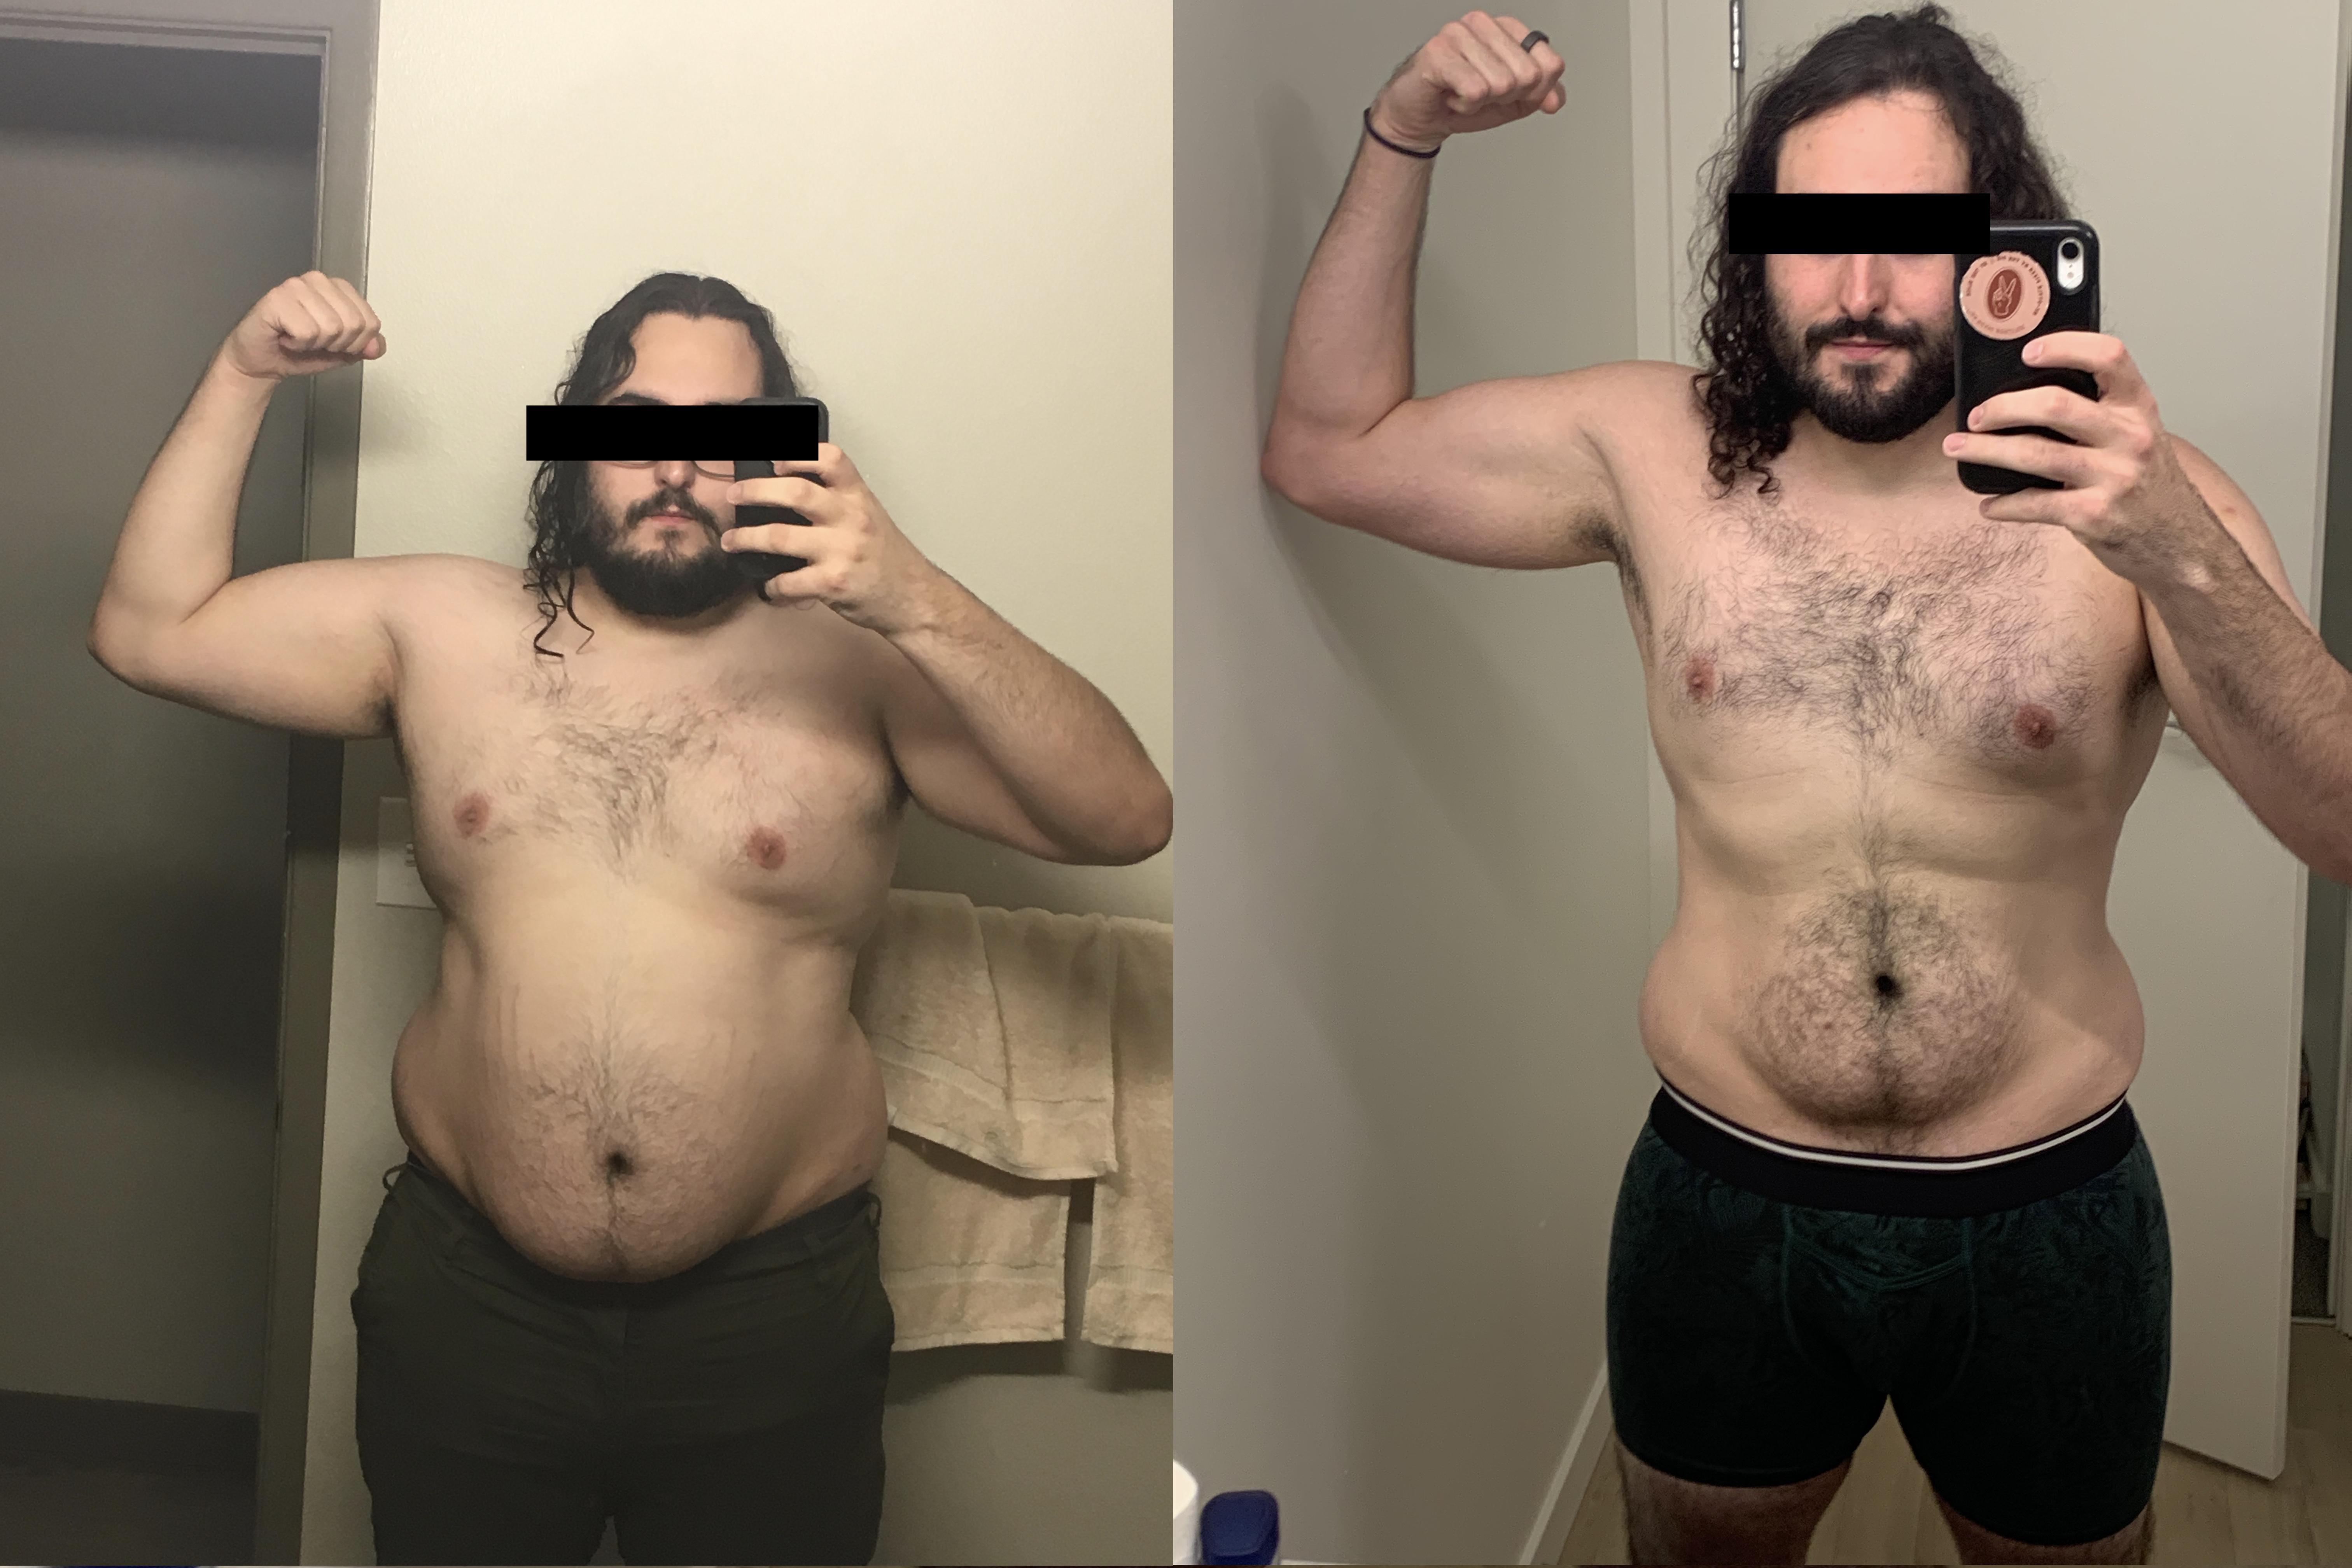 6 foot Male 82 lbs Weight Loss 312 lbs to 230 lbs